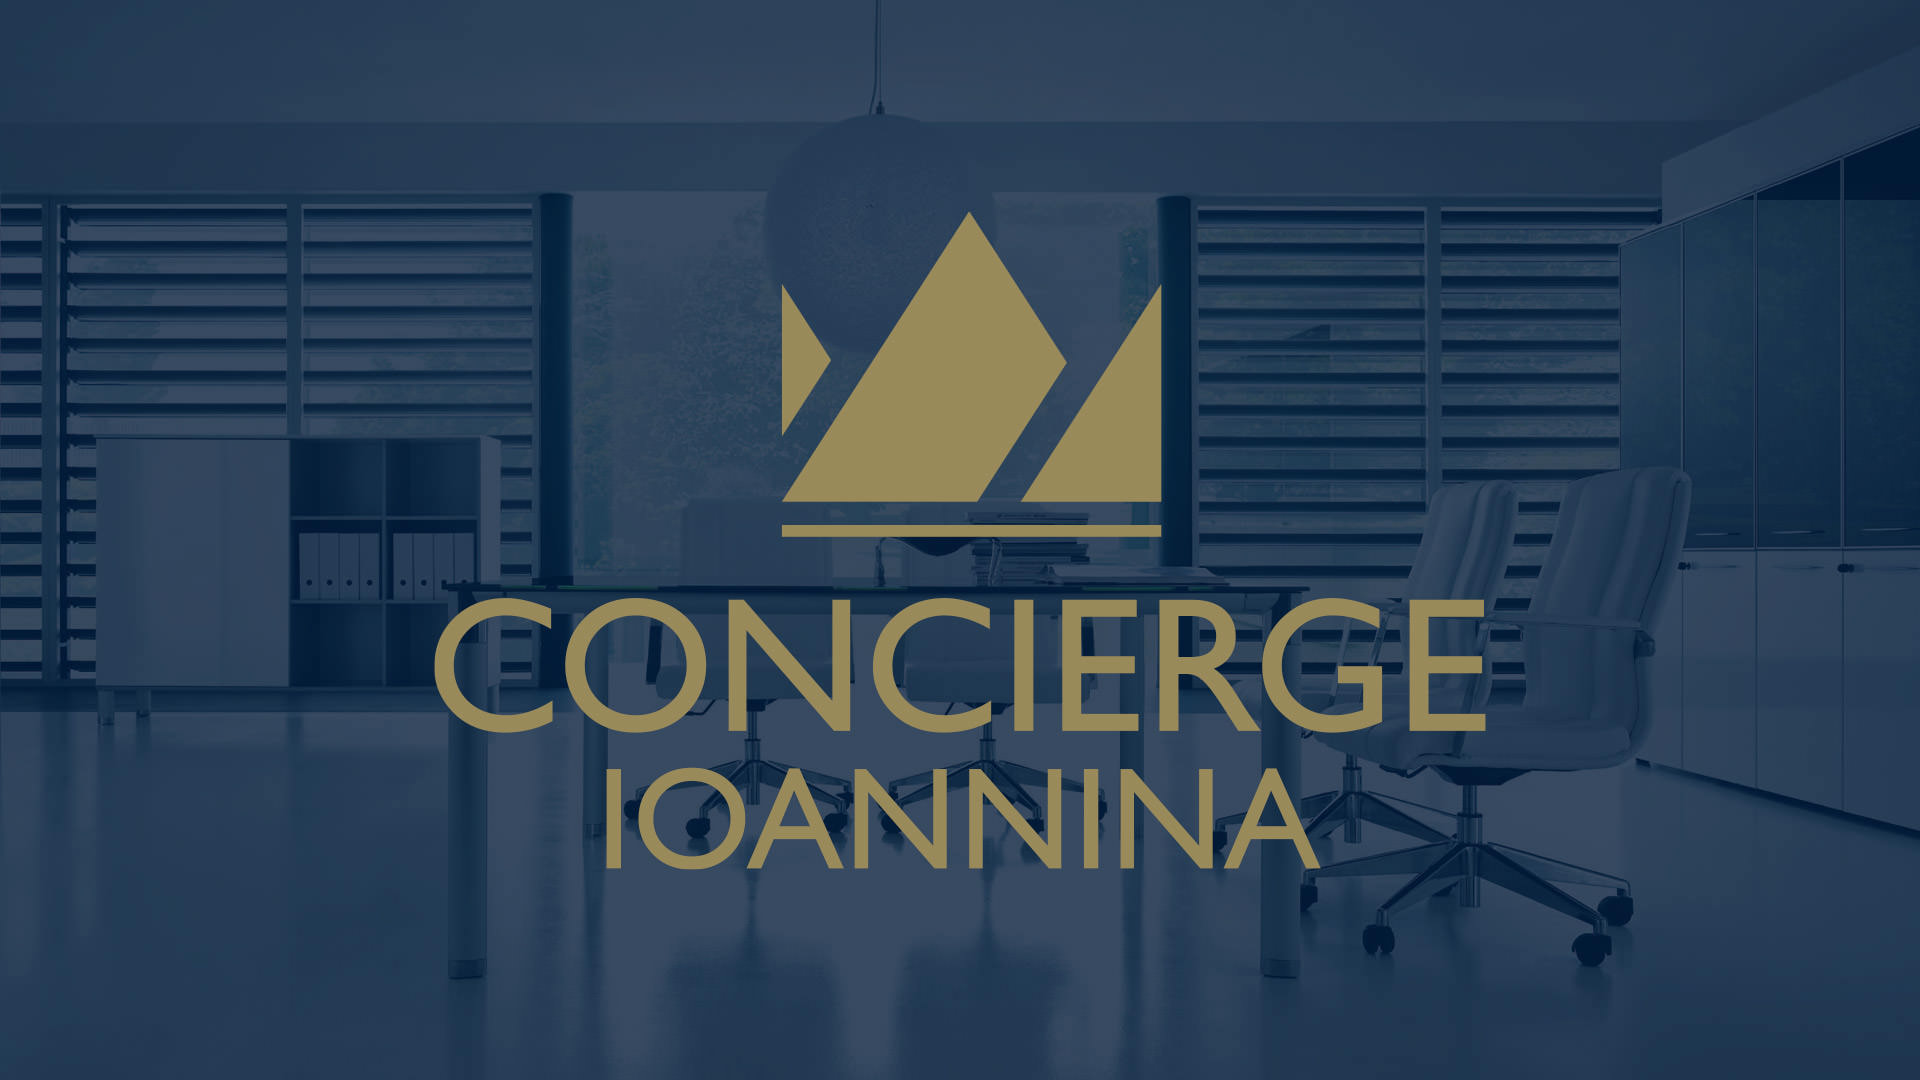 Concierge Ioannina - About Us